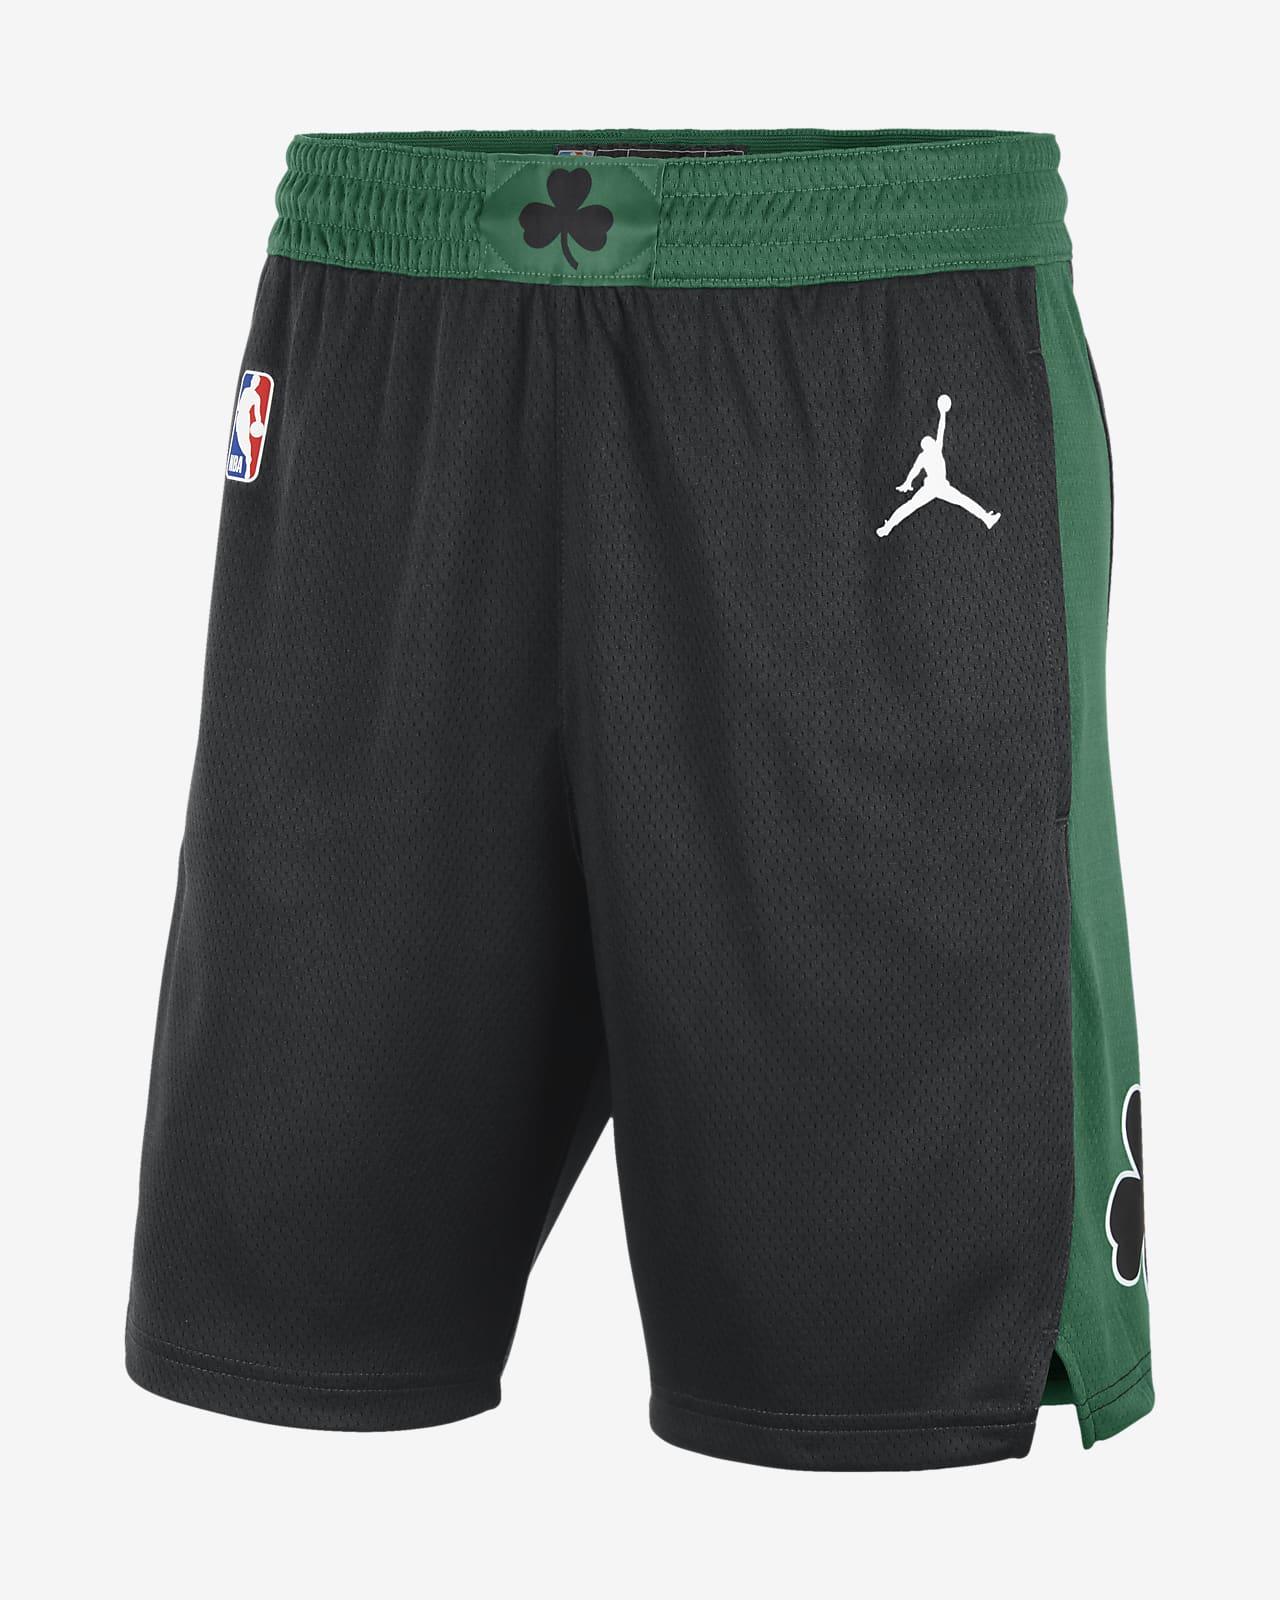 Celtics Statement Edition 2020 Men's Jordan NBA Swingman Shorts